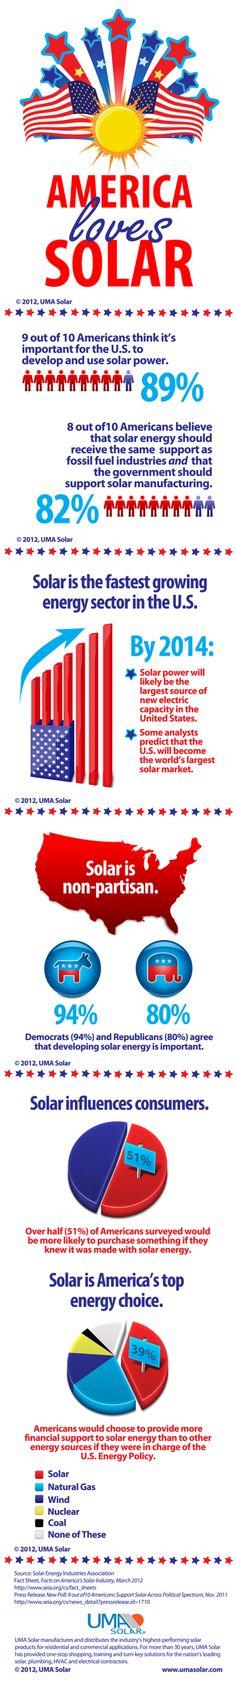 America Loves #Solar Power